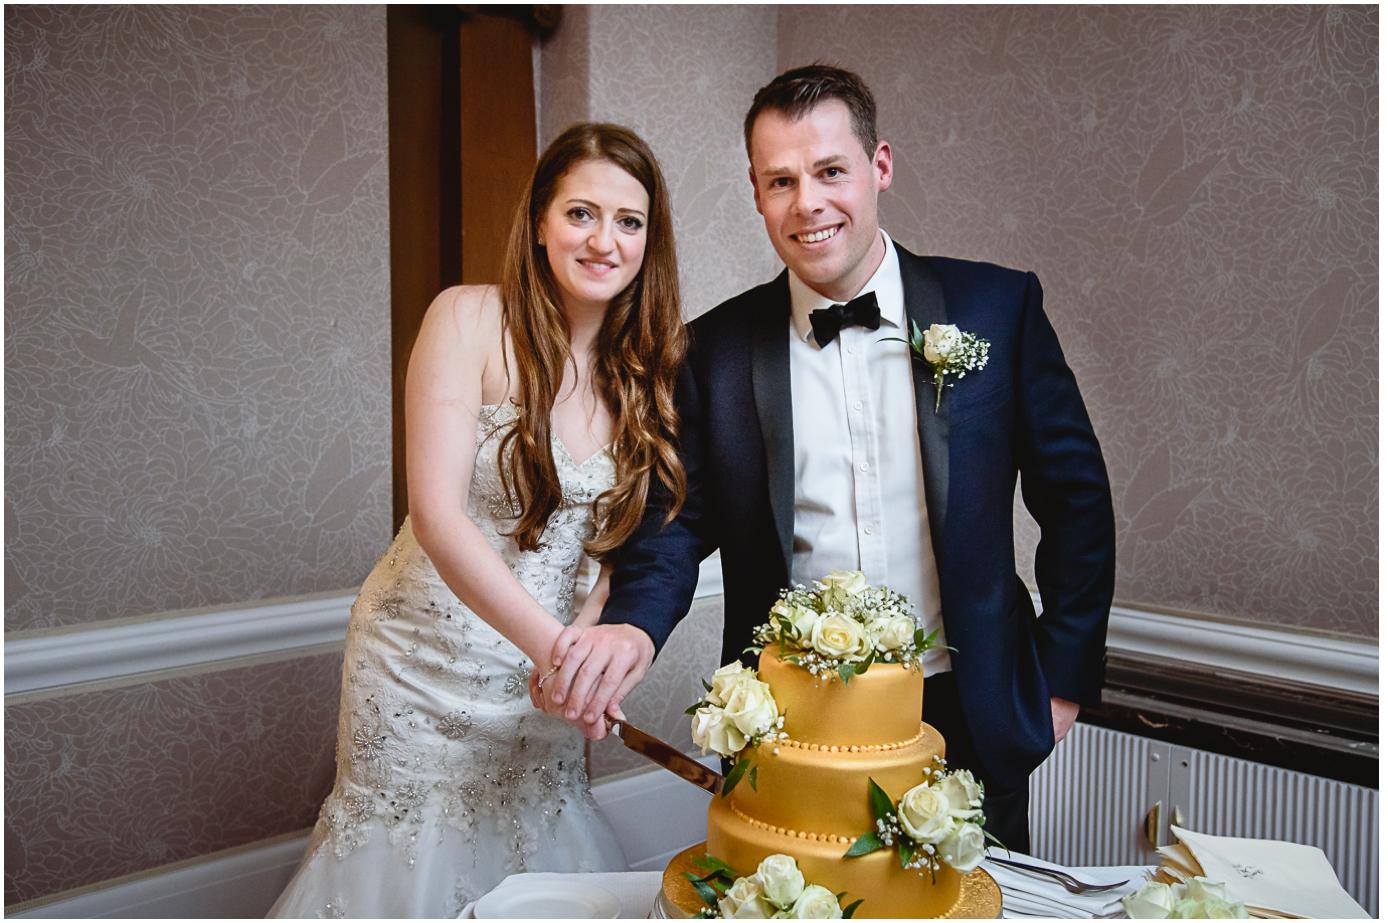 75 - Esmat and Angus - St. Ermin's Hotel London wedding photographer